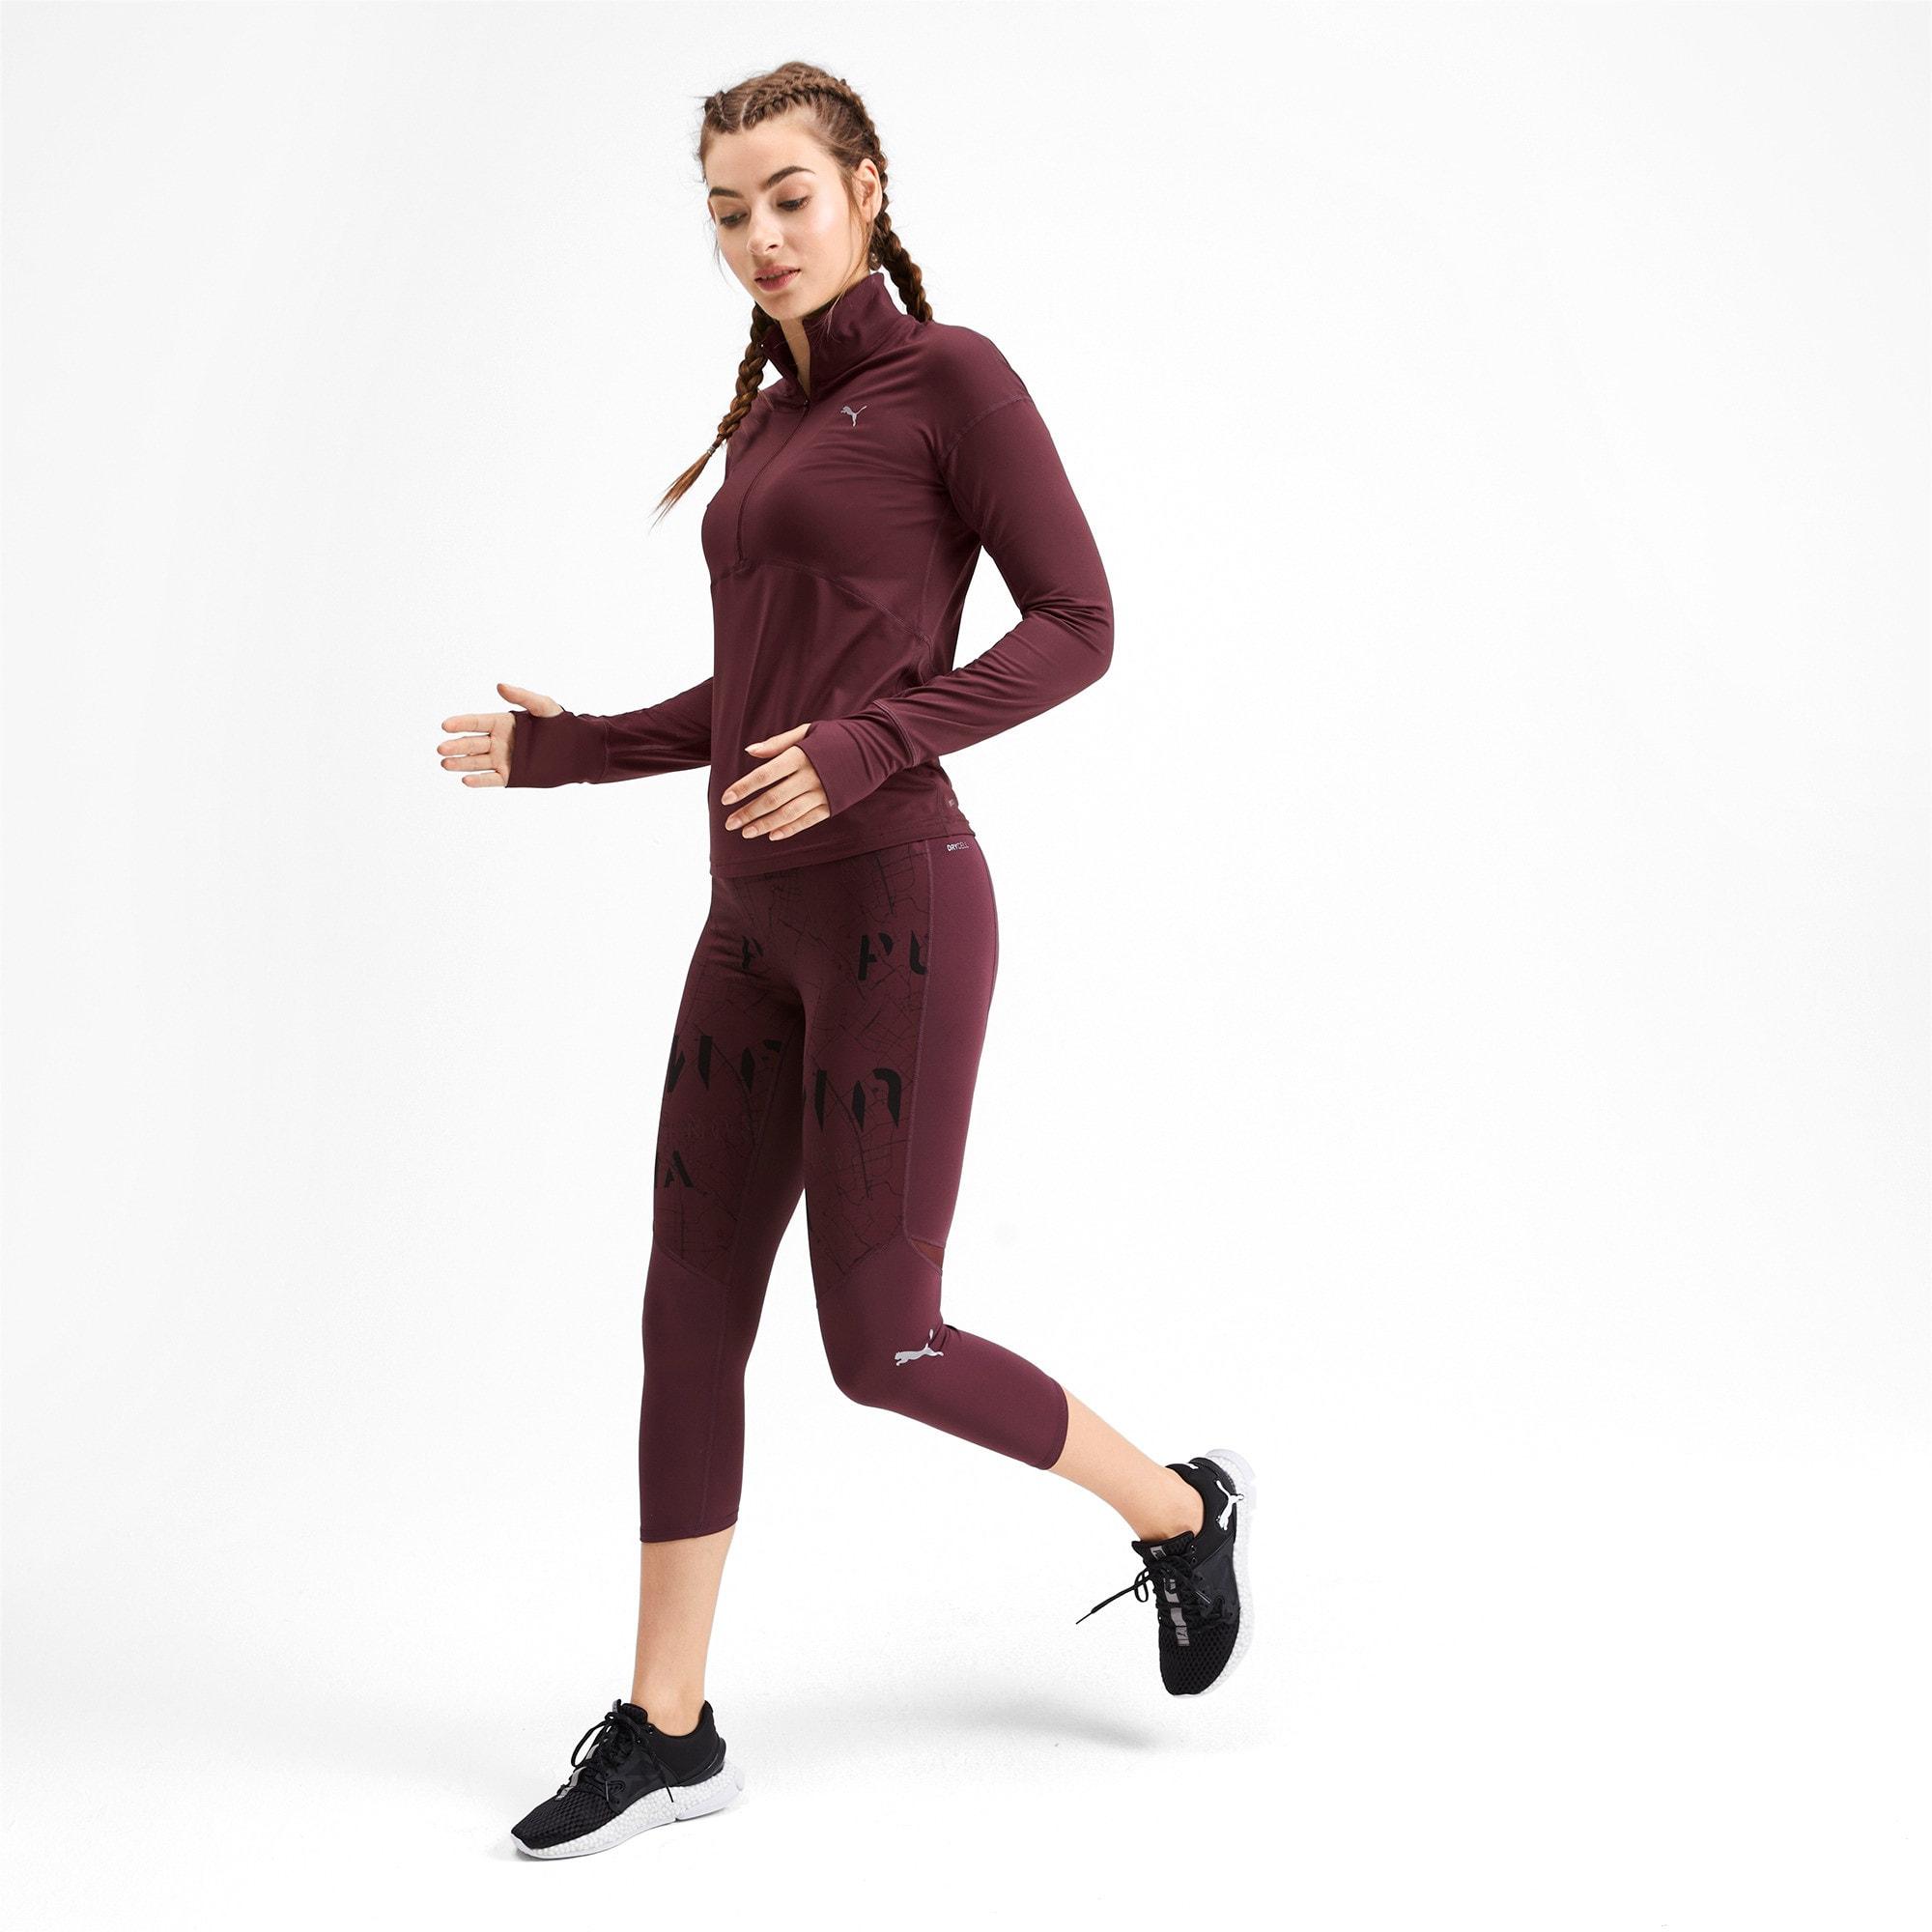 Thumbnail 3 of ADHM 2019 IGNITE Long Sleeve Women's Running Pullover, Vineyard Wine, medium-IND